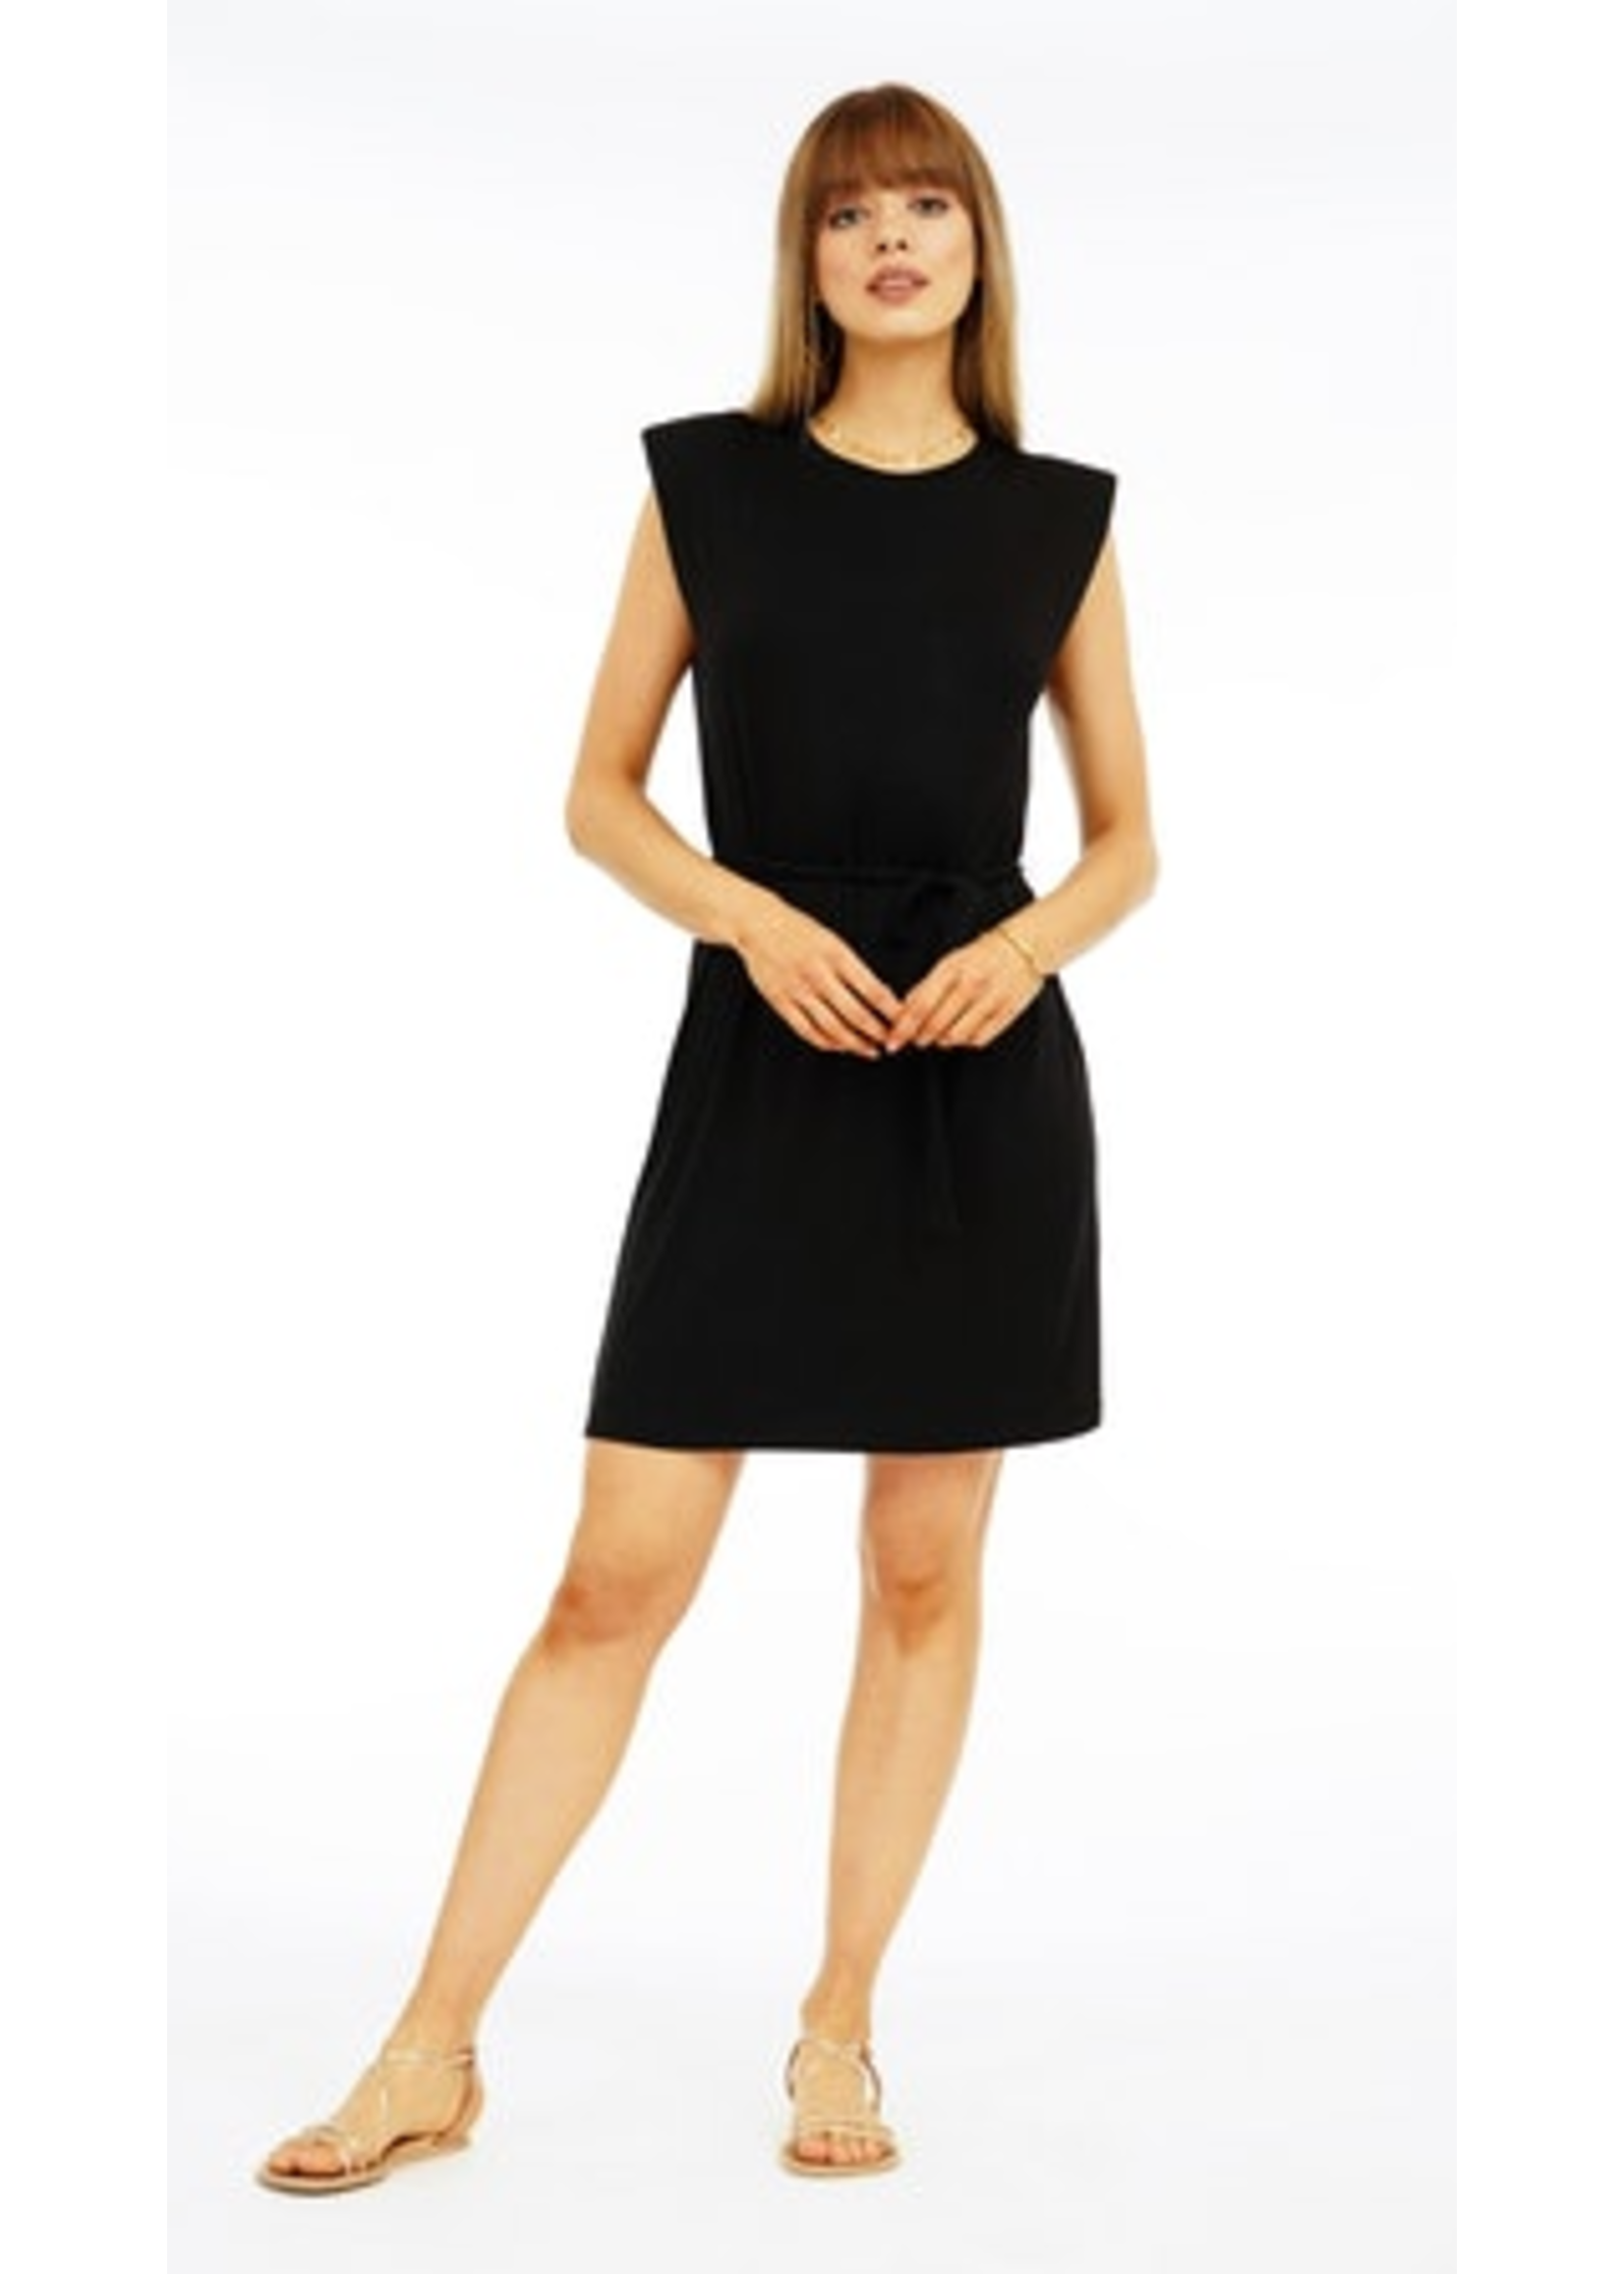 Veronica M Black Cap Dress